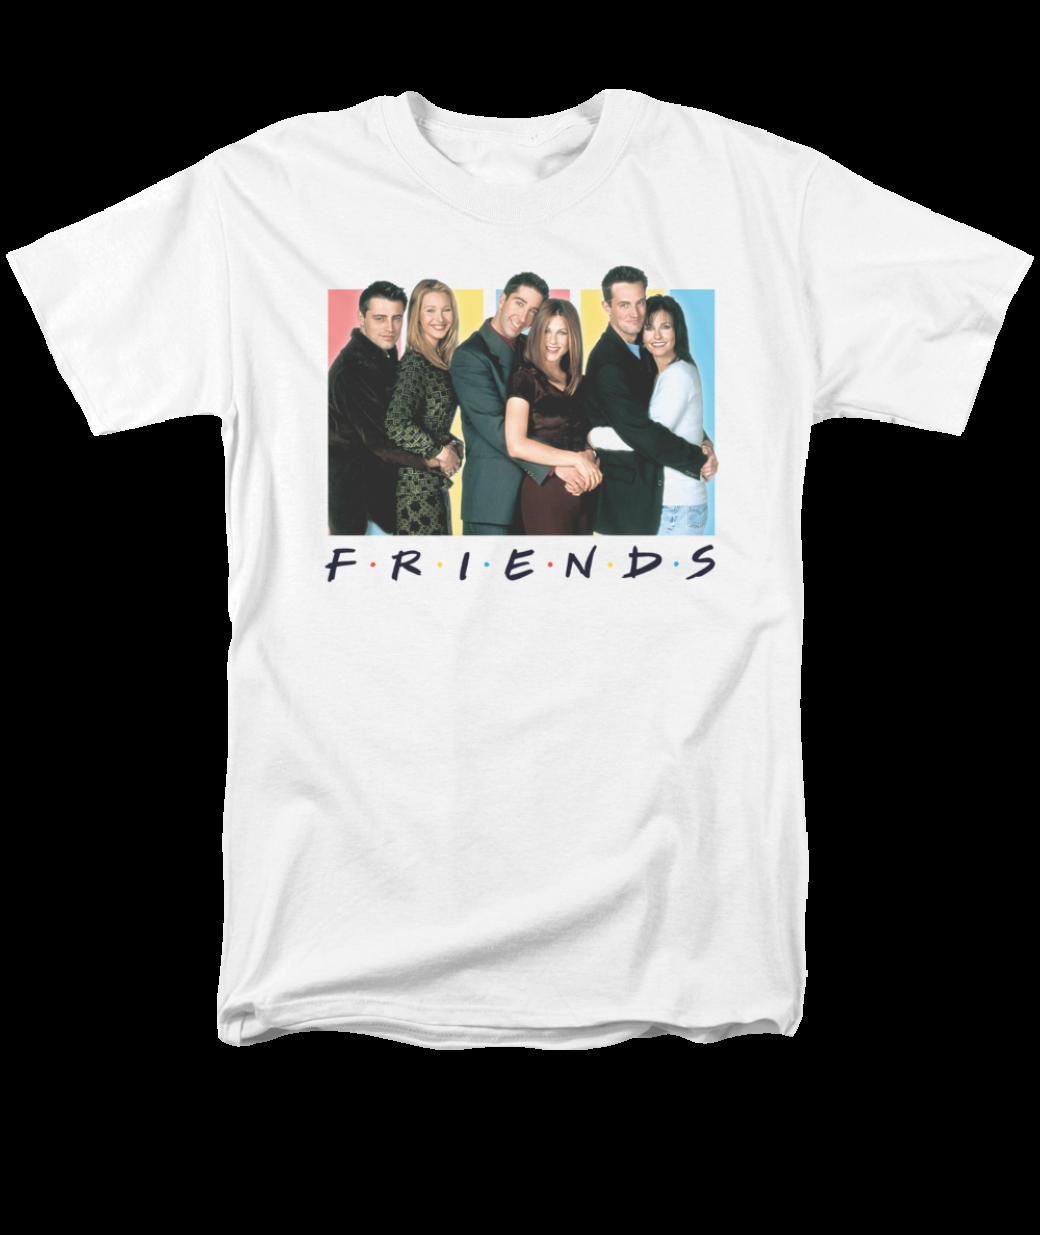 d867a9e516e60 FRIENDS/CAST LOGO | Classic Tv Show T Shirts | Popfunk | Clothing in ...